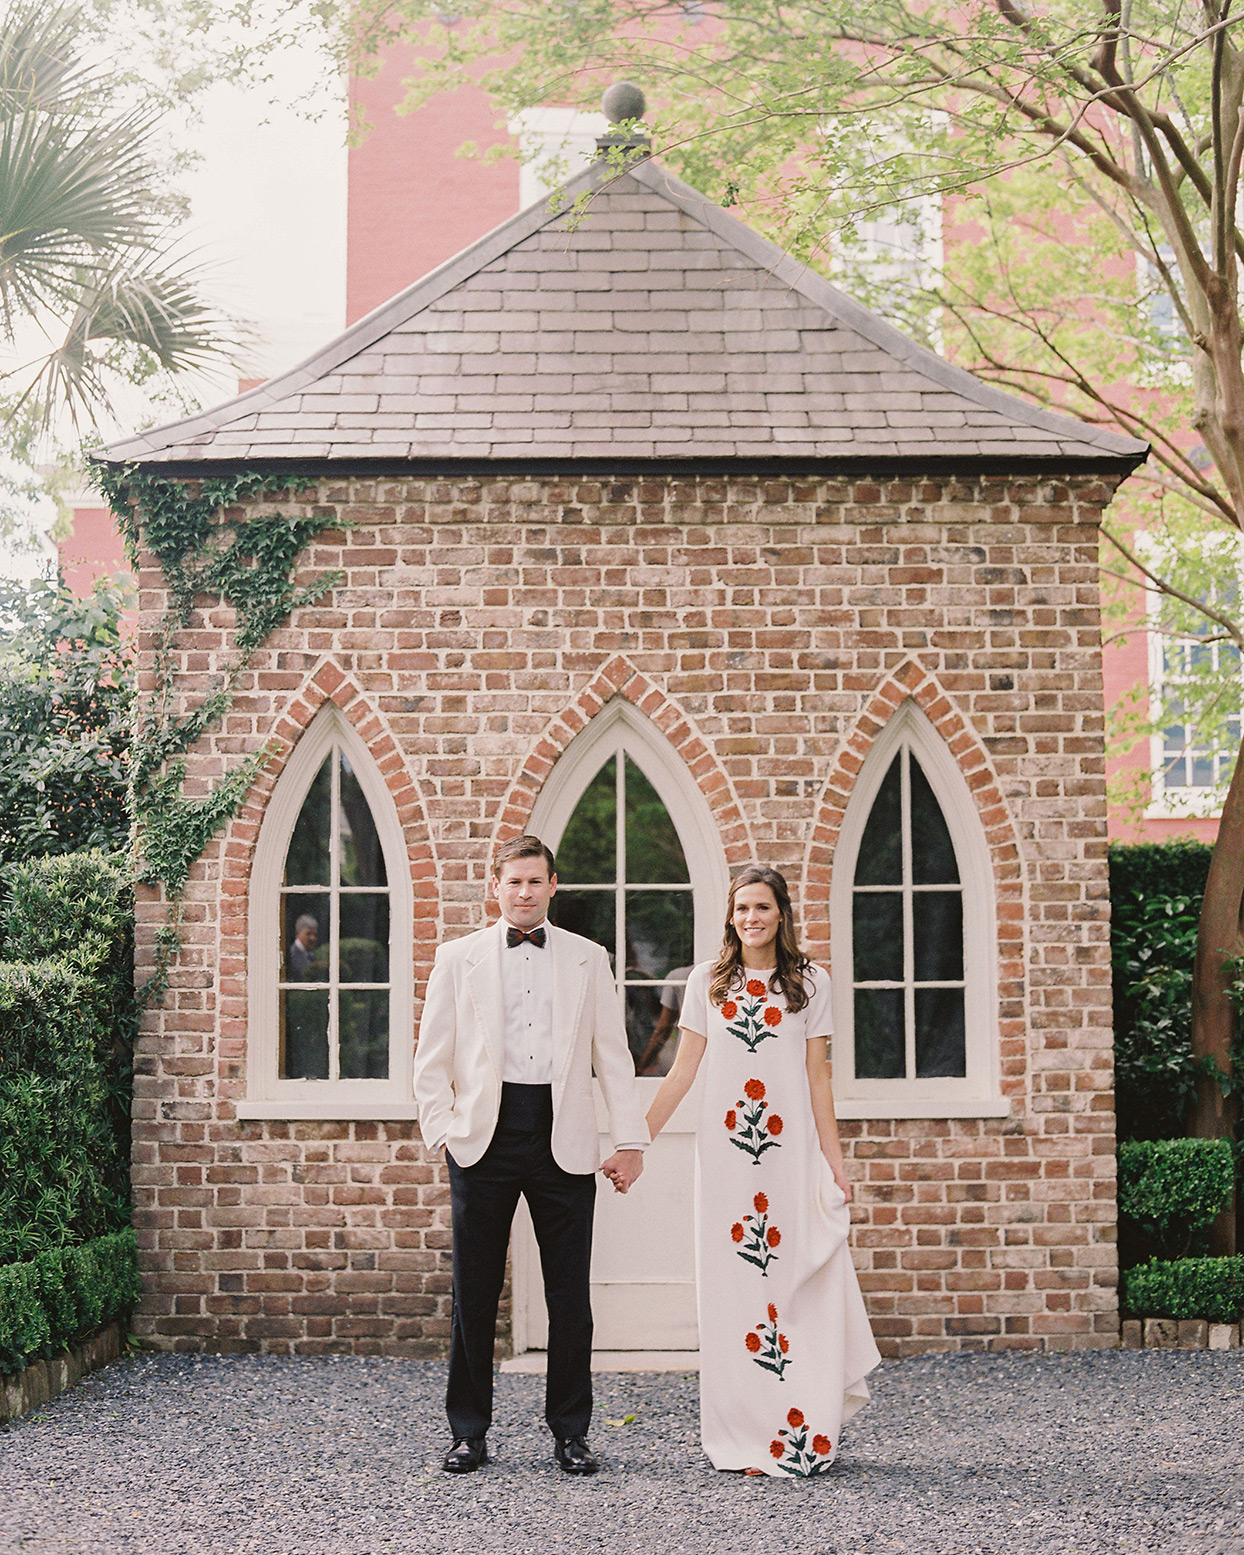 beverly steve wedding couple standing in front of garden house